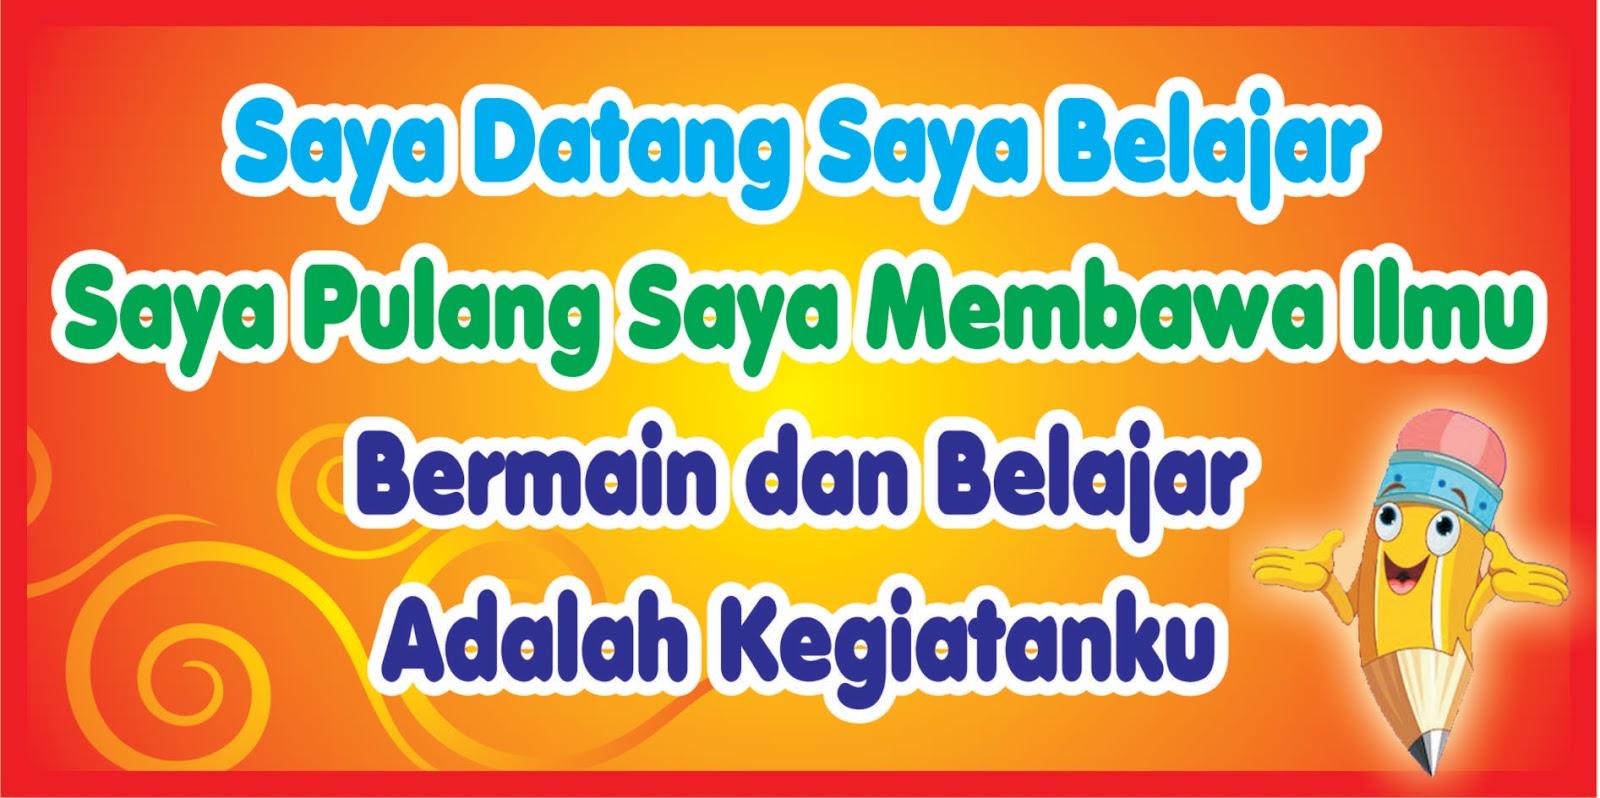 Slogan Pendidikan 2013 Kata Kata Slogan Pendidikan Embun Syurga Mi Sabiilut Taqwa 1 Sawahan Headline Animator